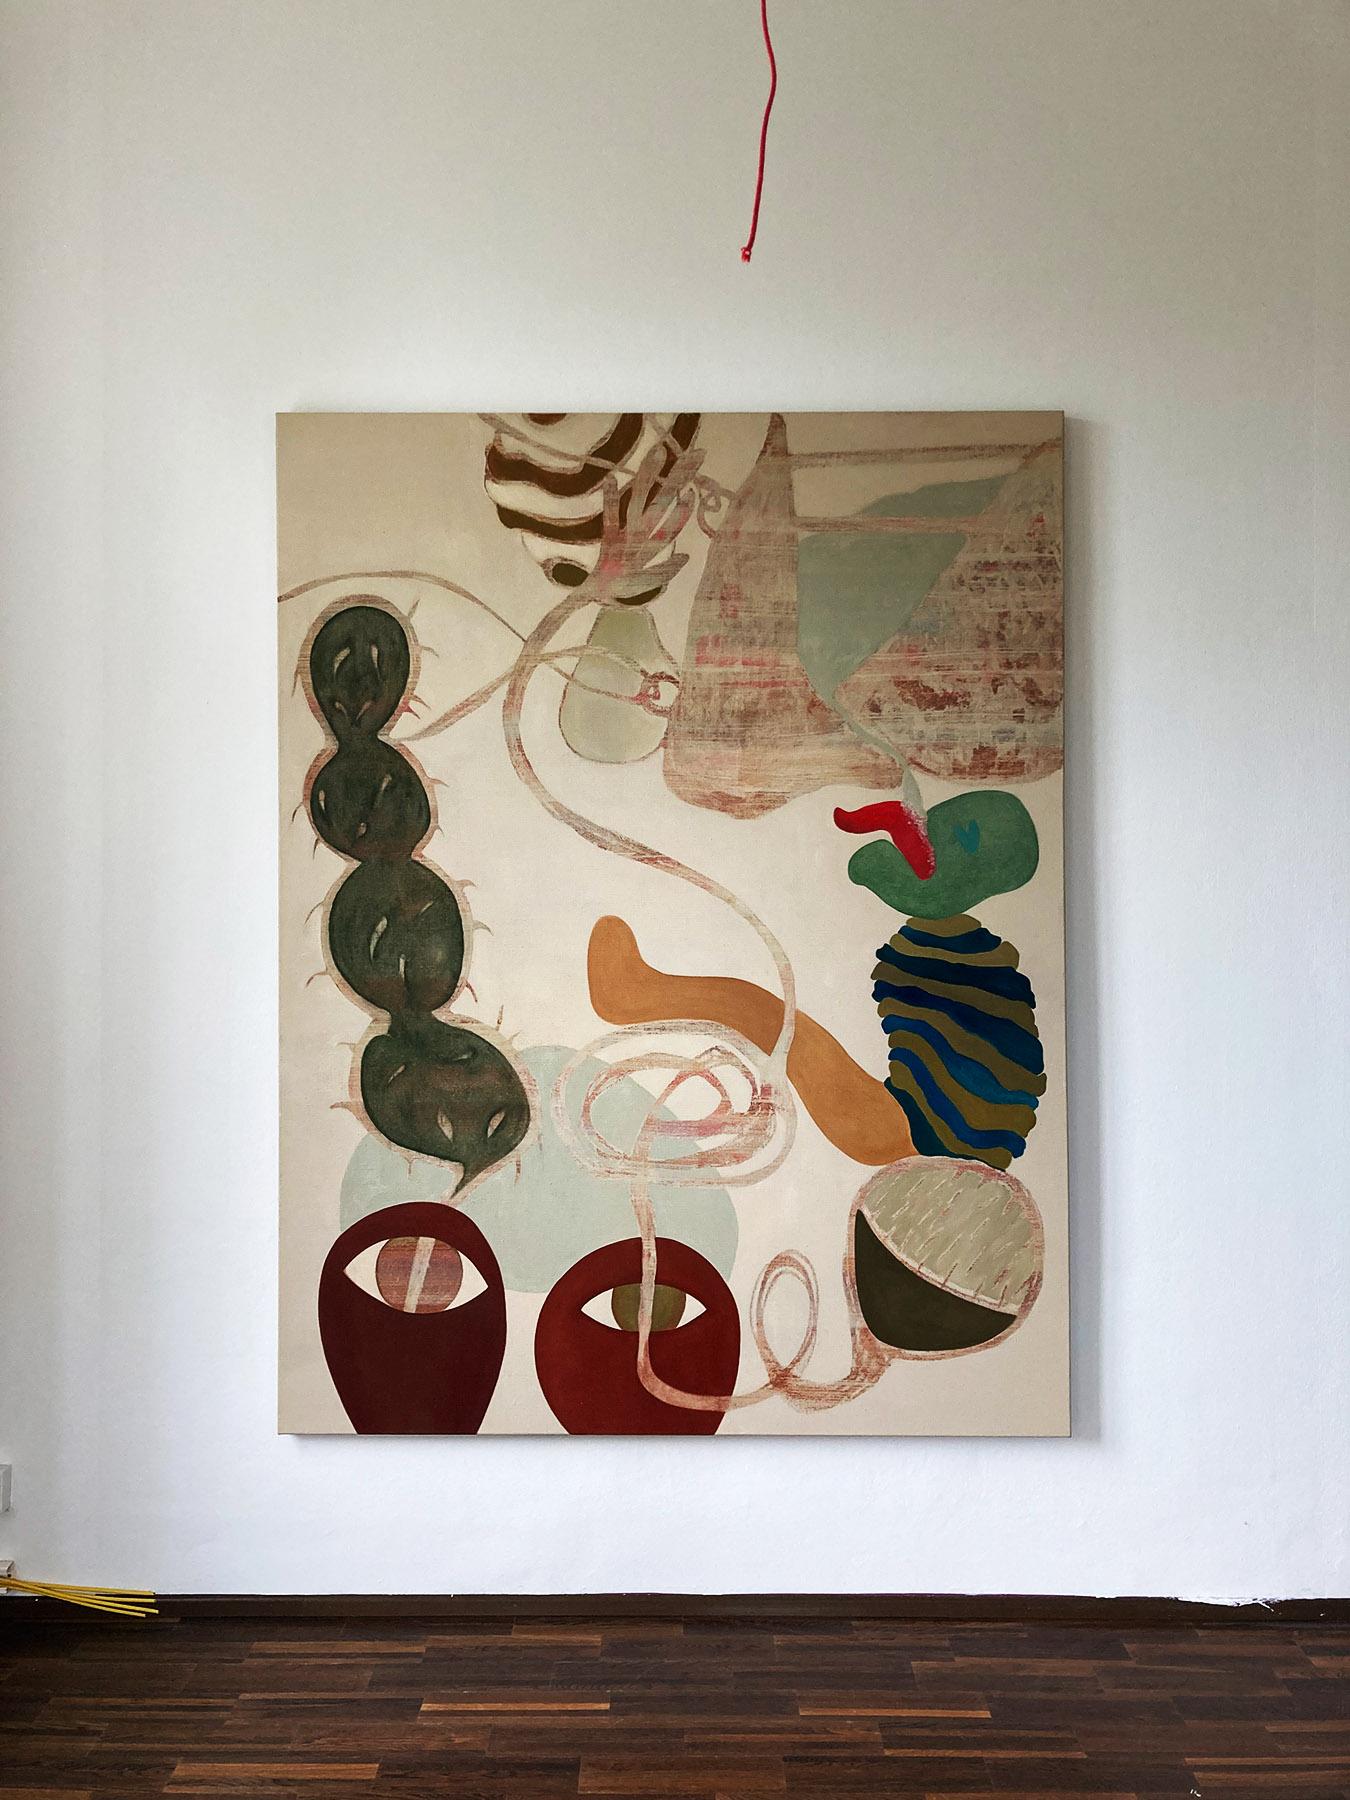 katharina spielmann, charim gallery, vienna, painting, female art, art to collect